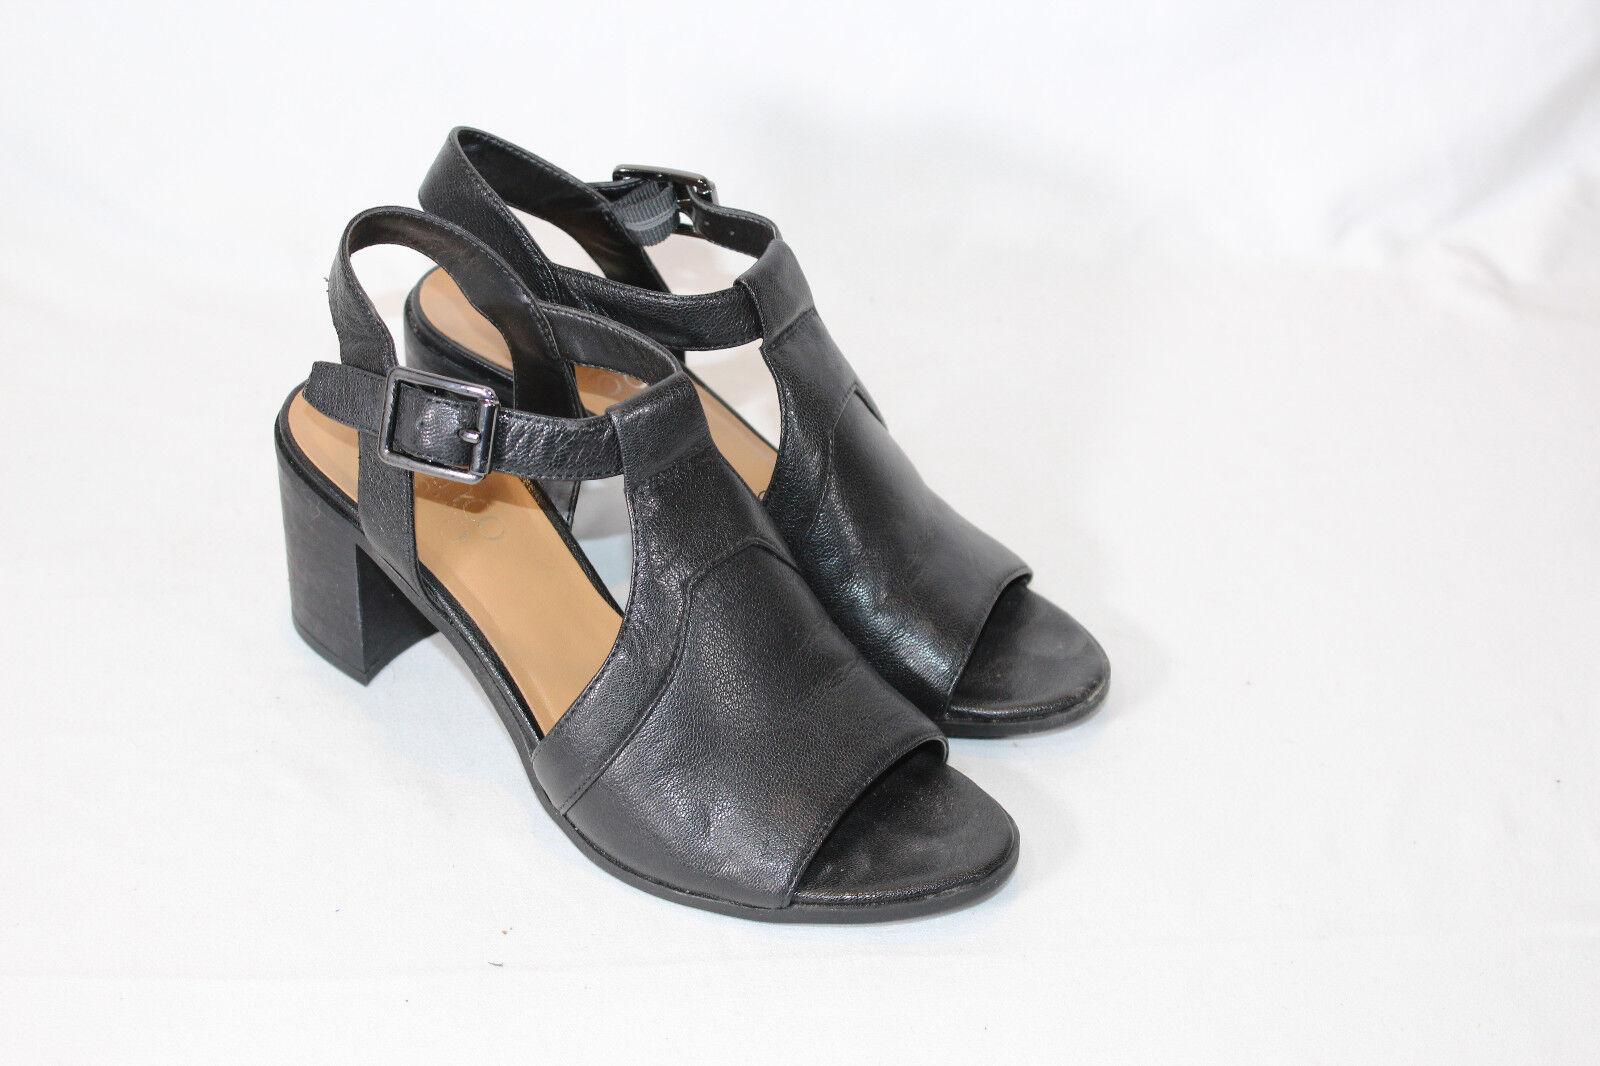 Franco Sarto T-Strap Sandals Ankle Strap - Heron 6 medium black